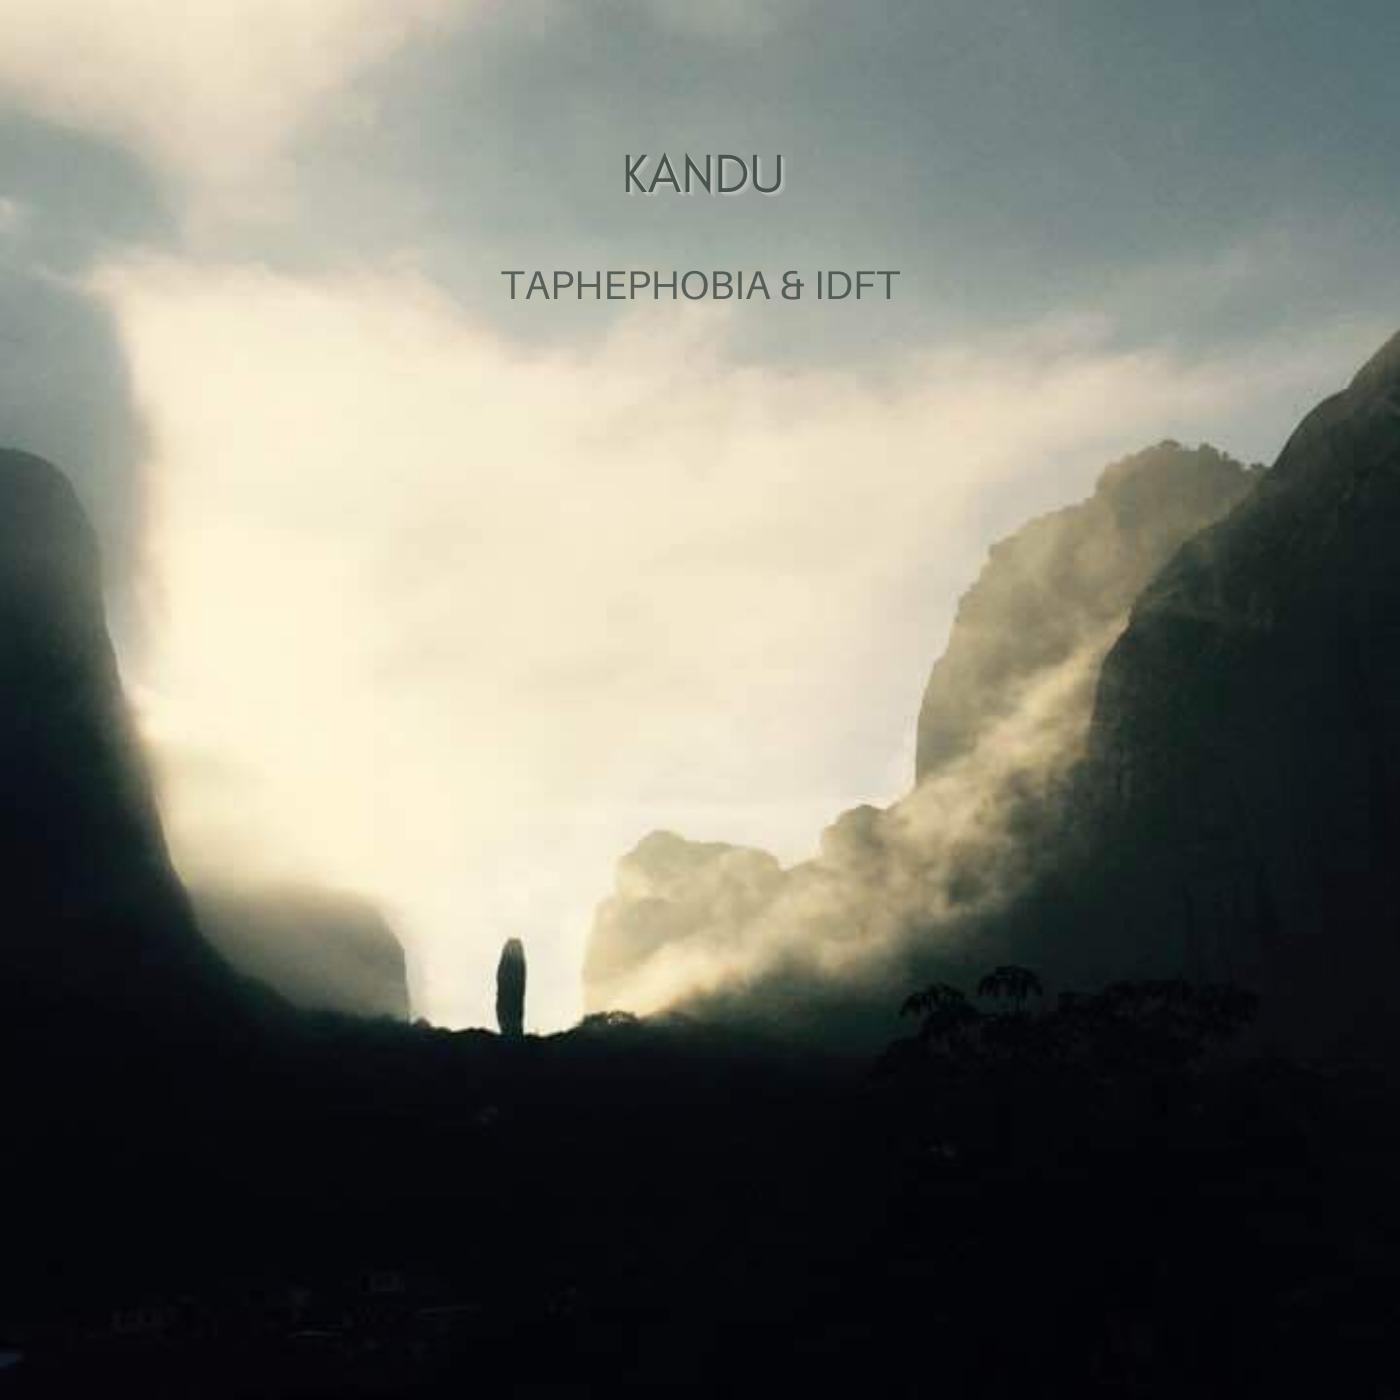 Kandu cover